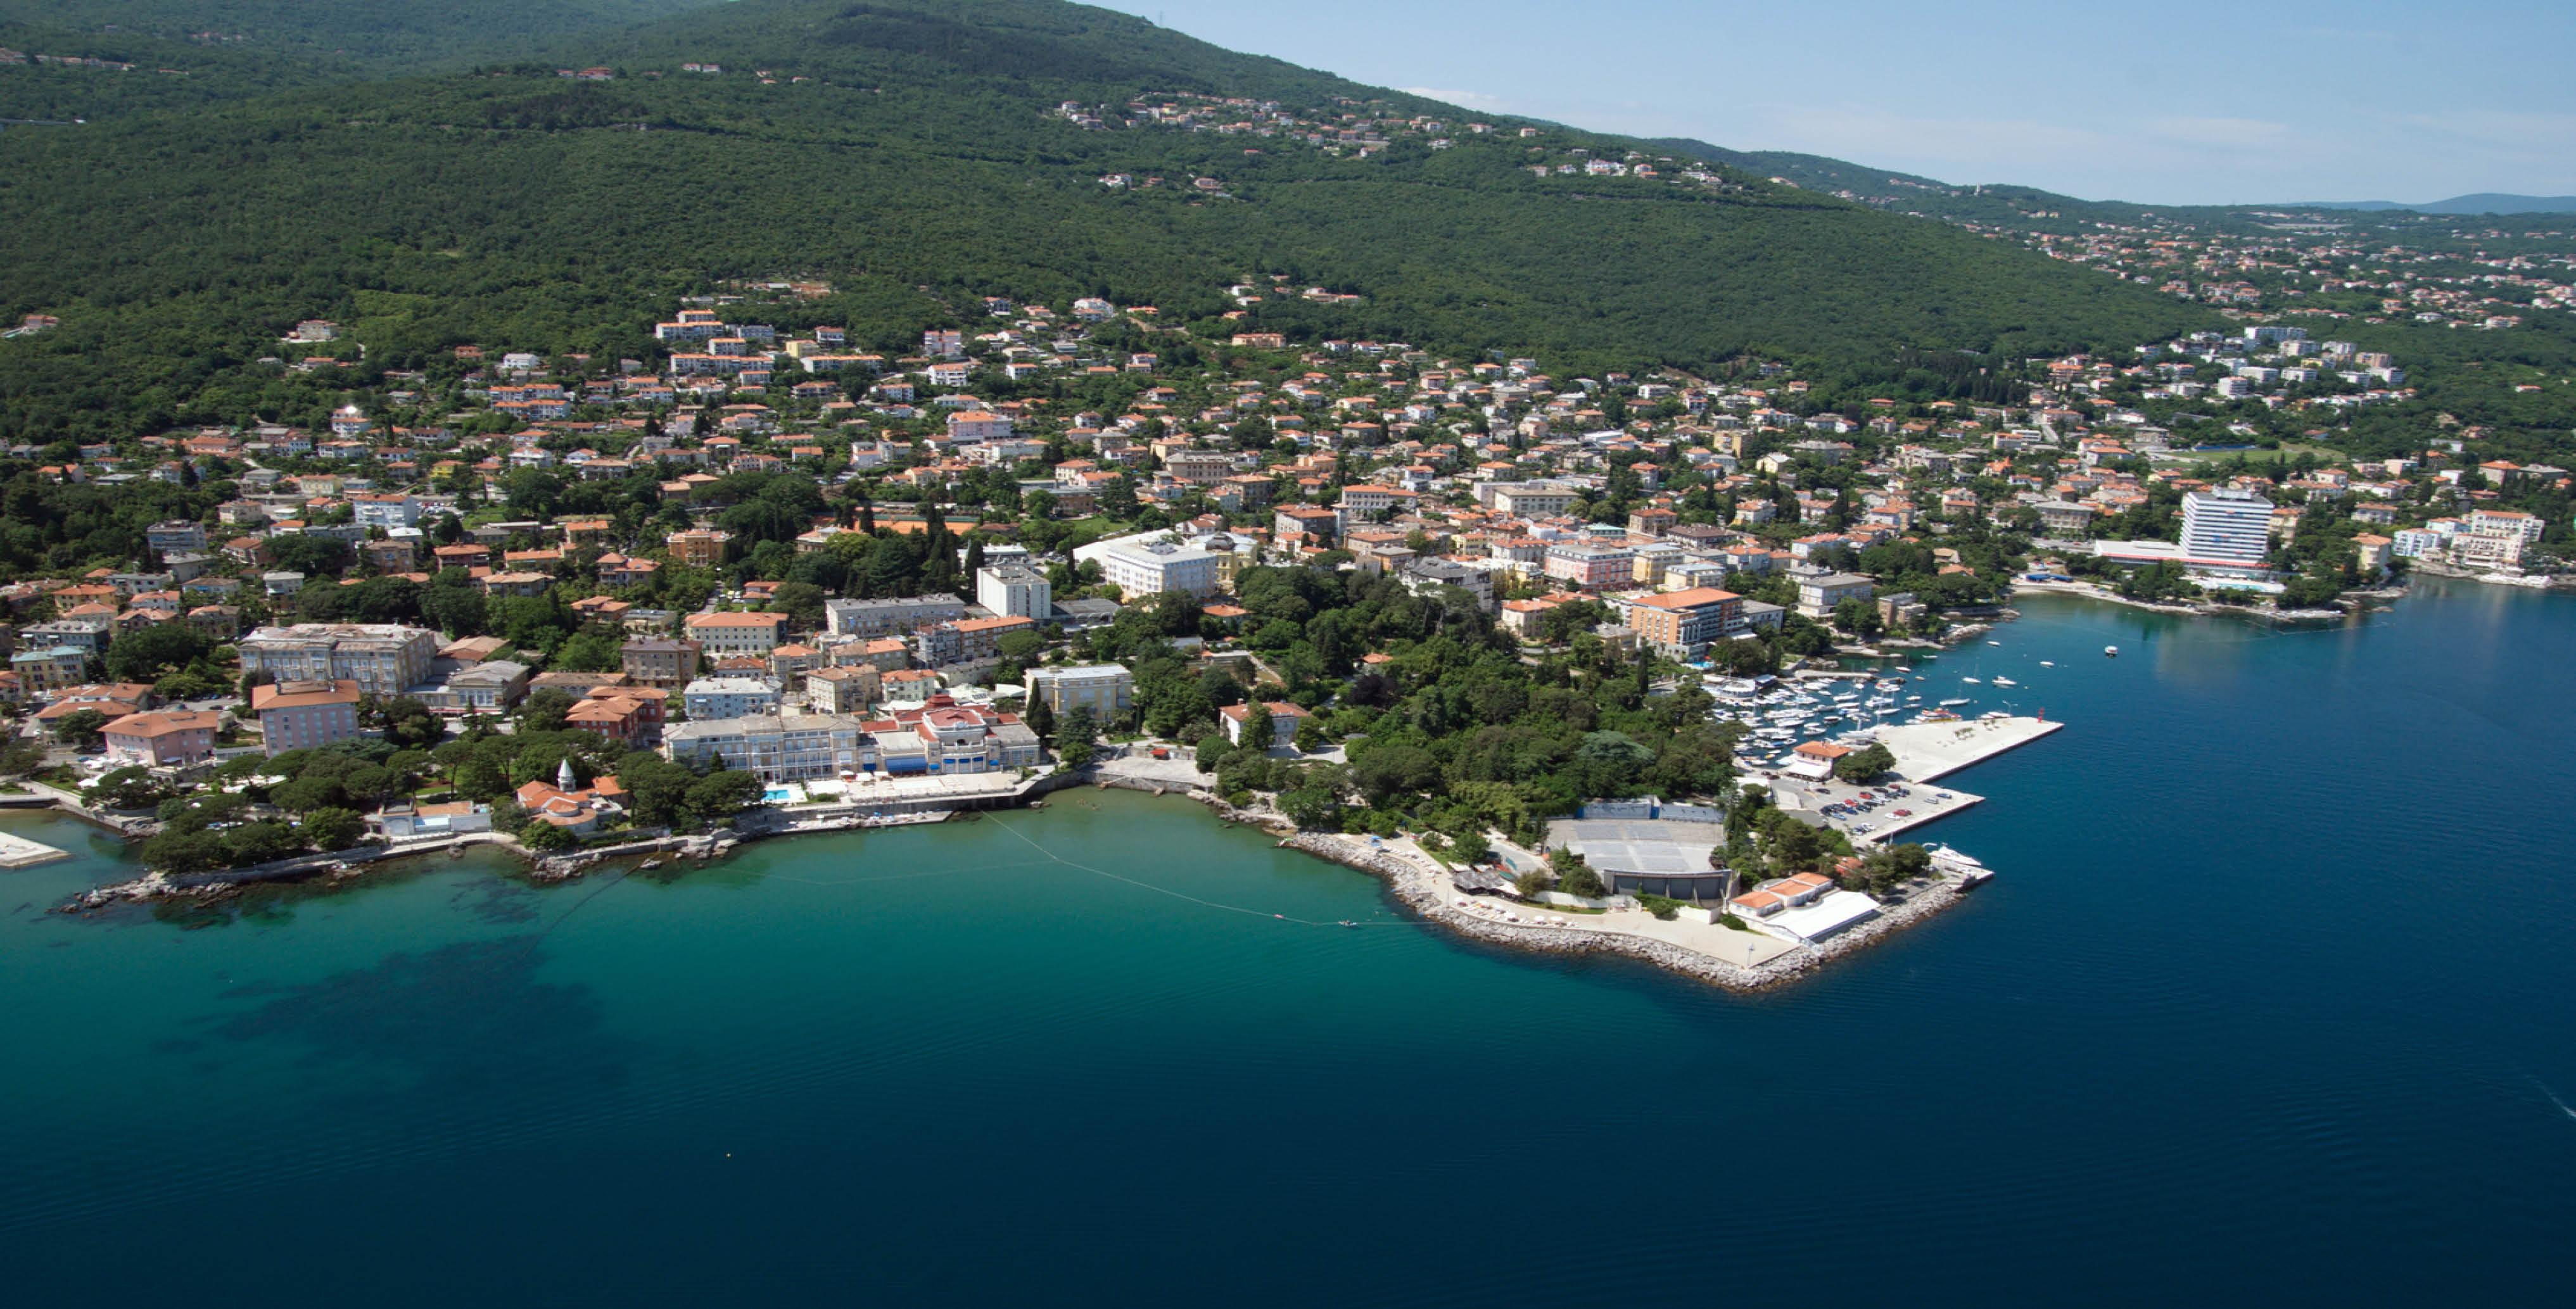 Croatia 39 s opatija riviera select travel holidays for Design hotel opatija croatia